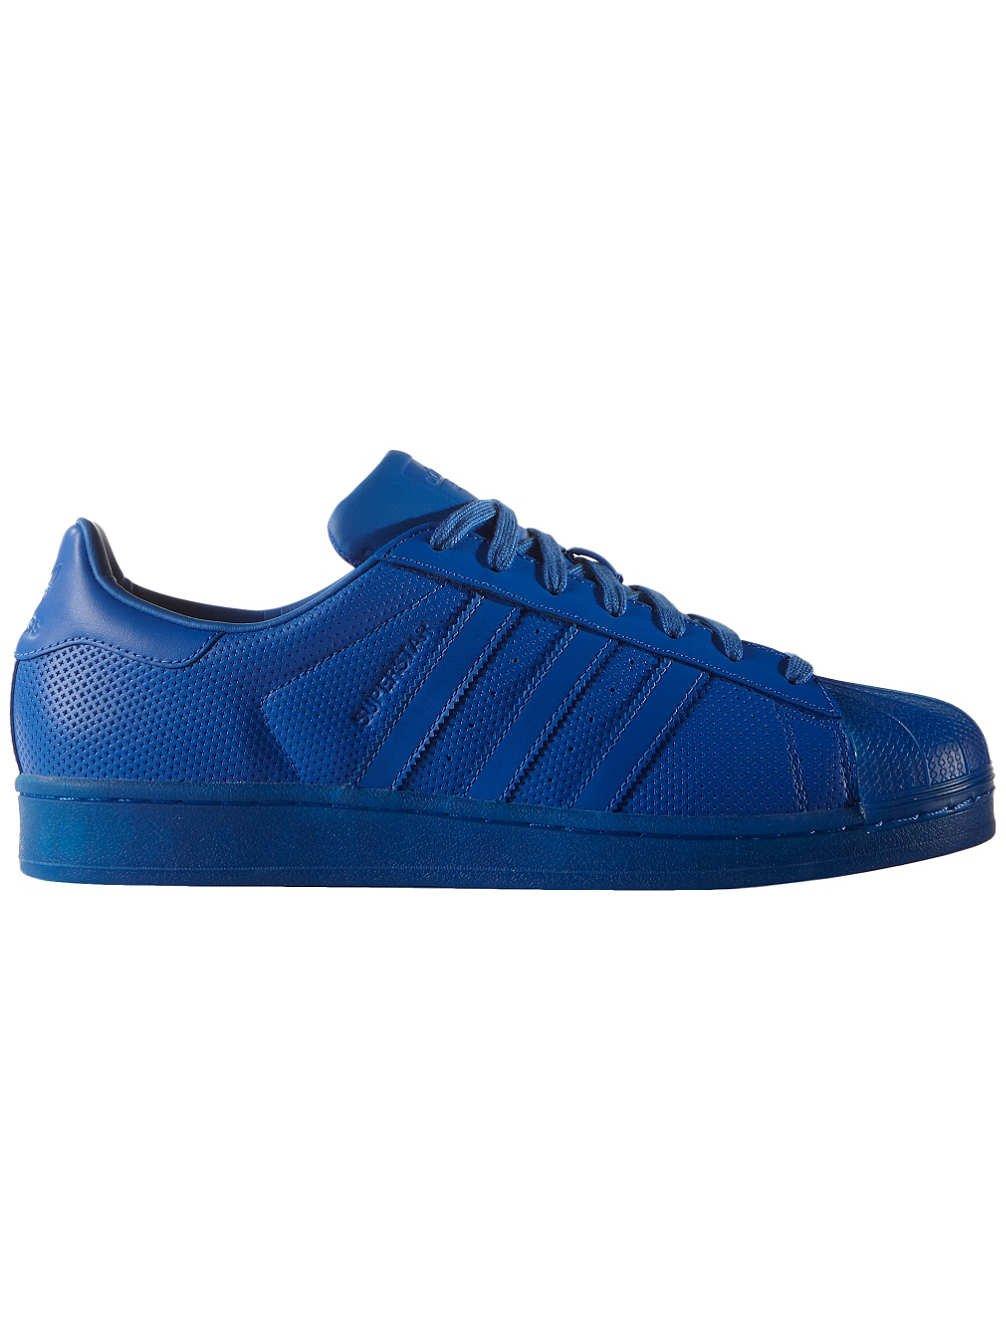 Adidas Superstar - Zapatillas de Deporte Unisex niños 41 1/3 EU|Blue/Blue/Blue